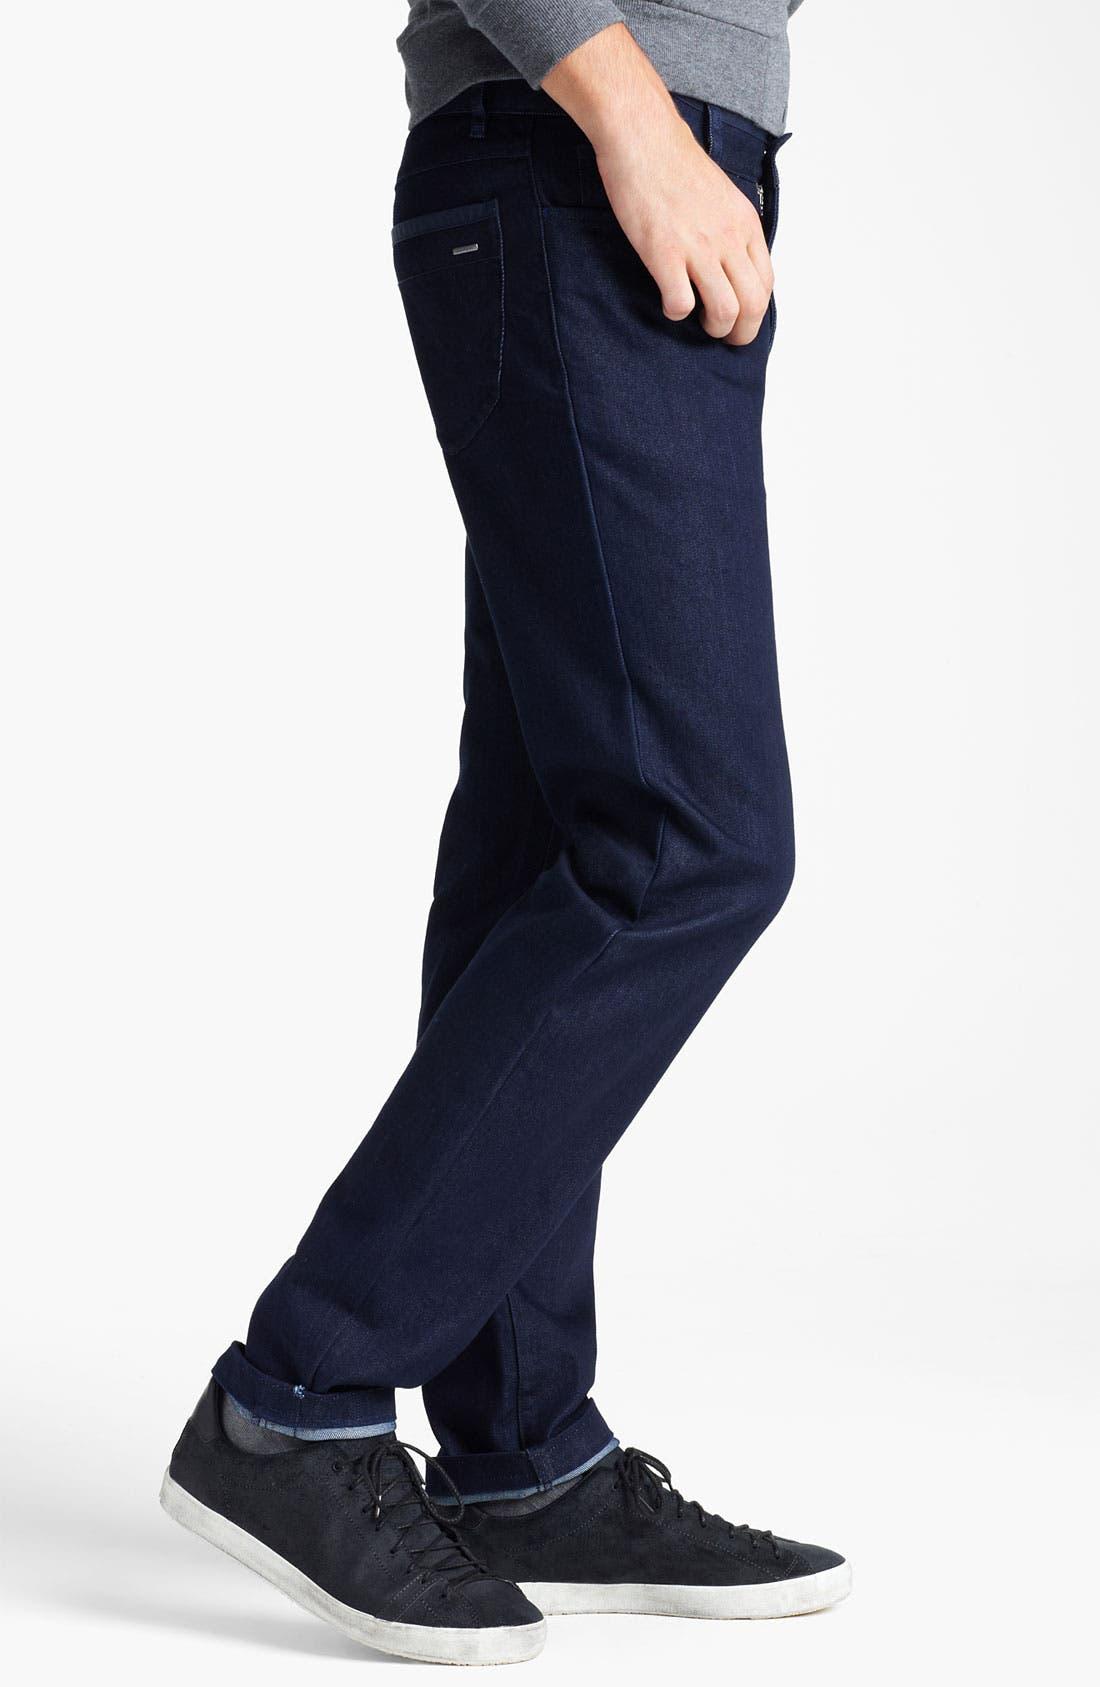 Alternate Image 3  - Zegna Sport 'Cool Max' Straight Leg Jeans (Dark Blue)